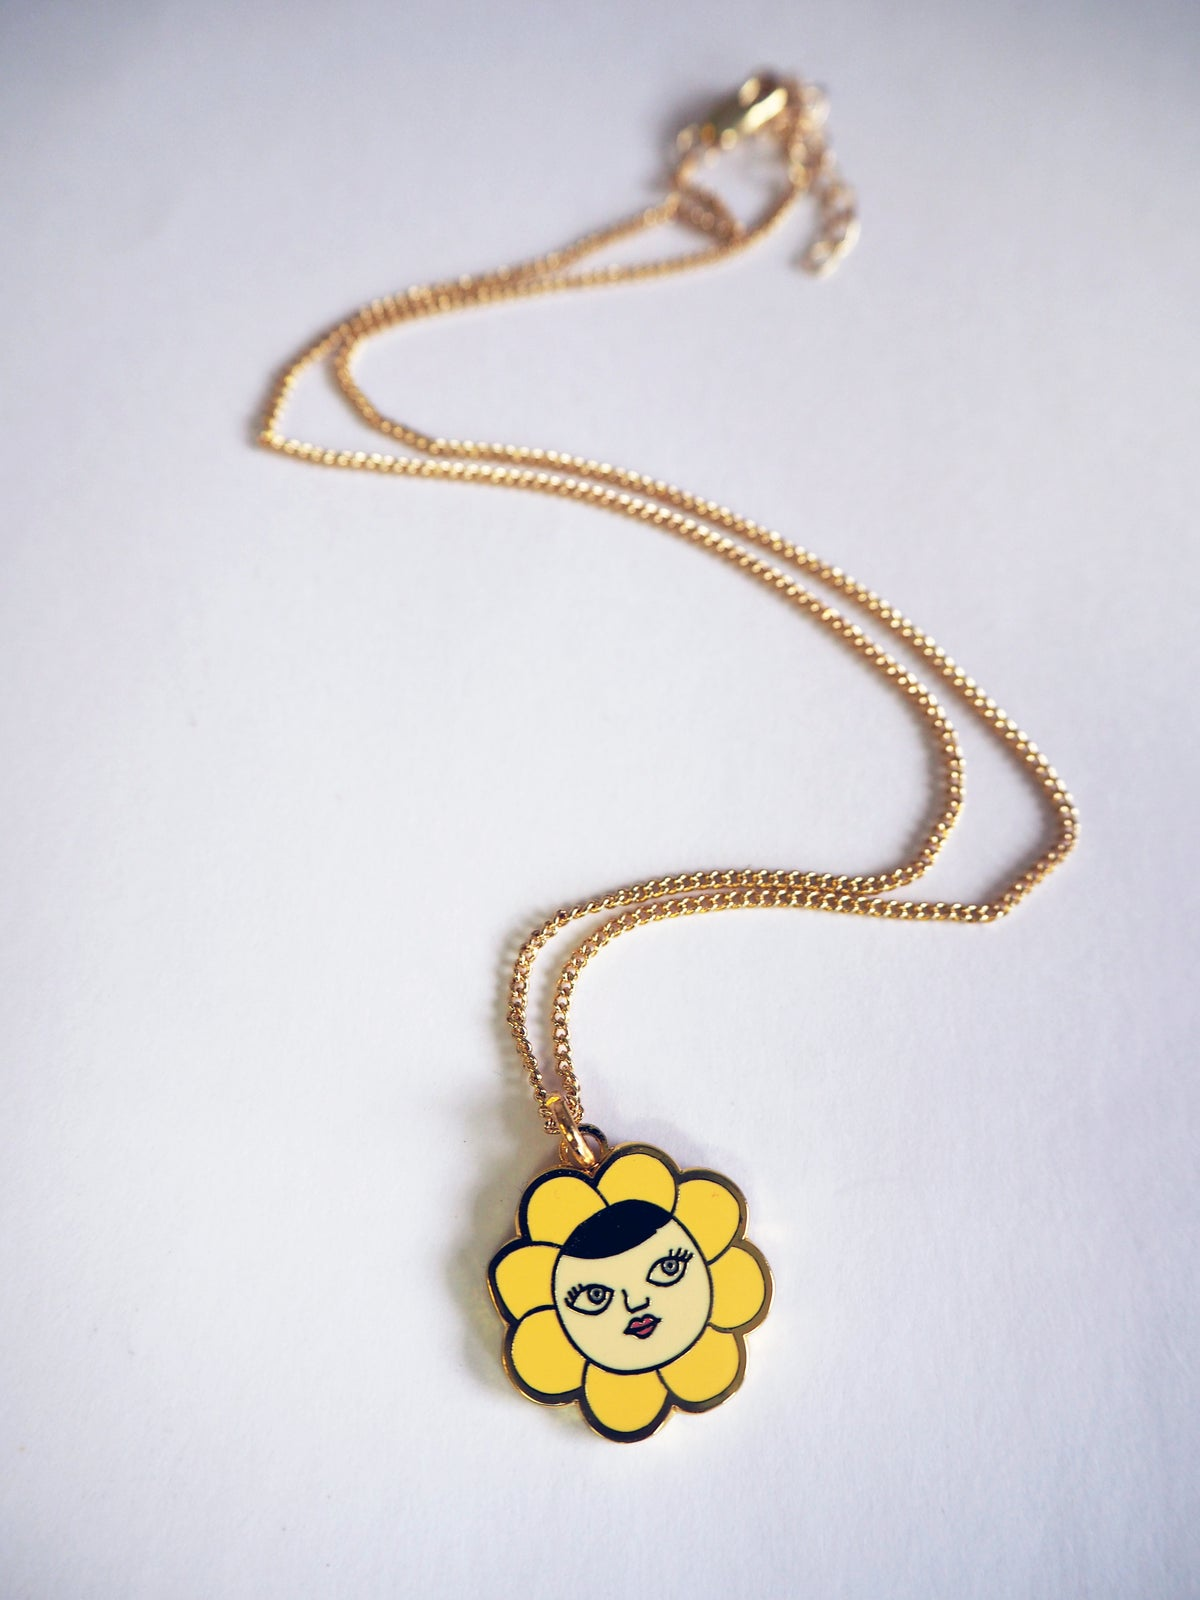 Flower Face Necklace